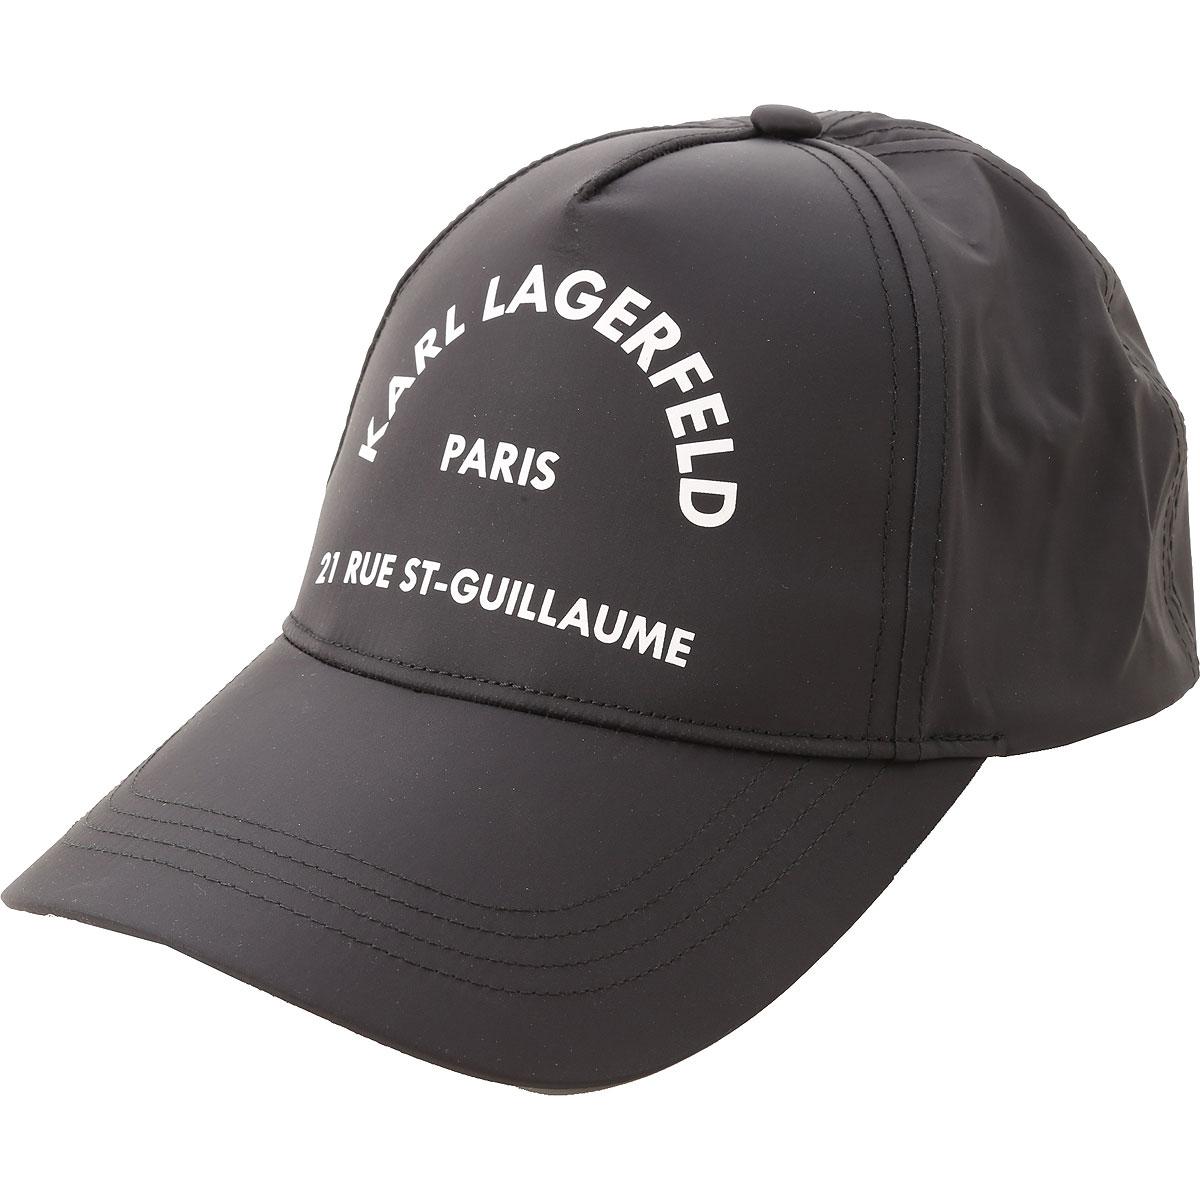 Karl Lagerfeld Chapeau Femme, Noir, Polyamide, 2019